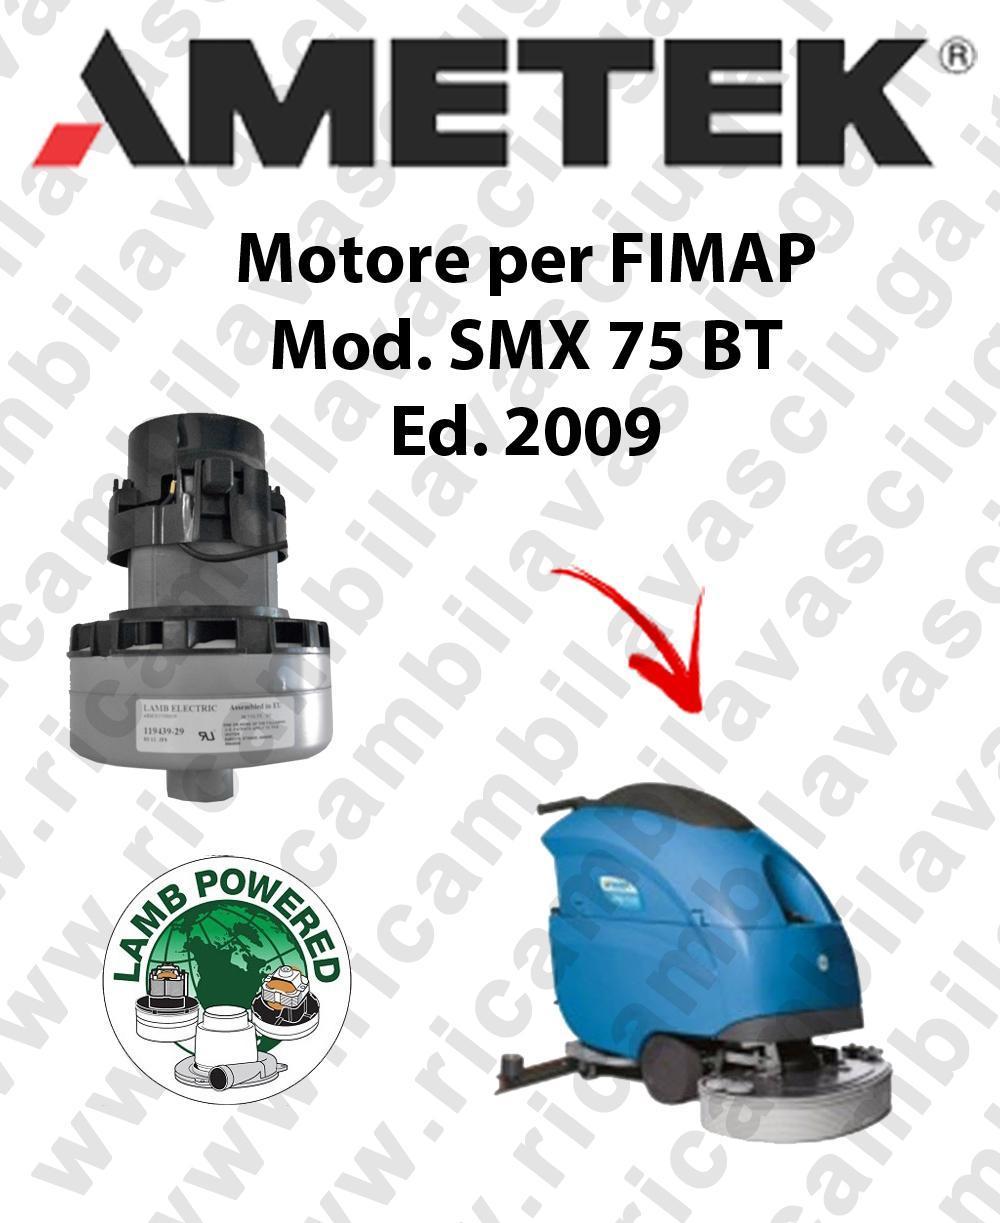 SMx 75 Bt   Vacuum motors AMETEK for scrubber dryer Fimap